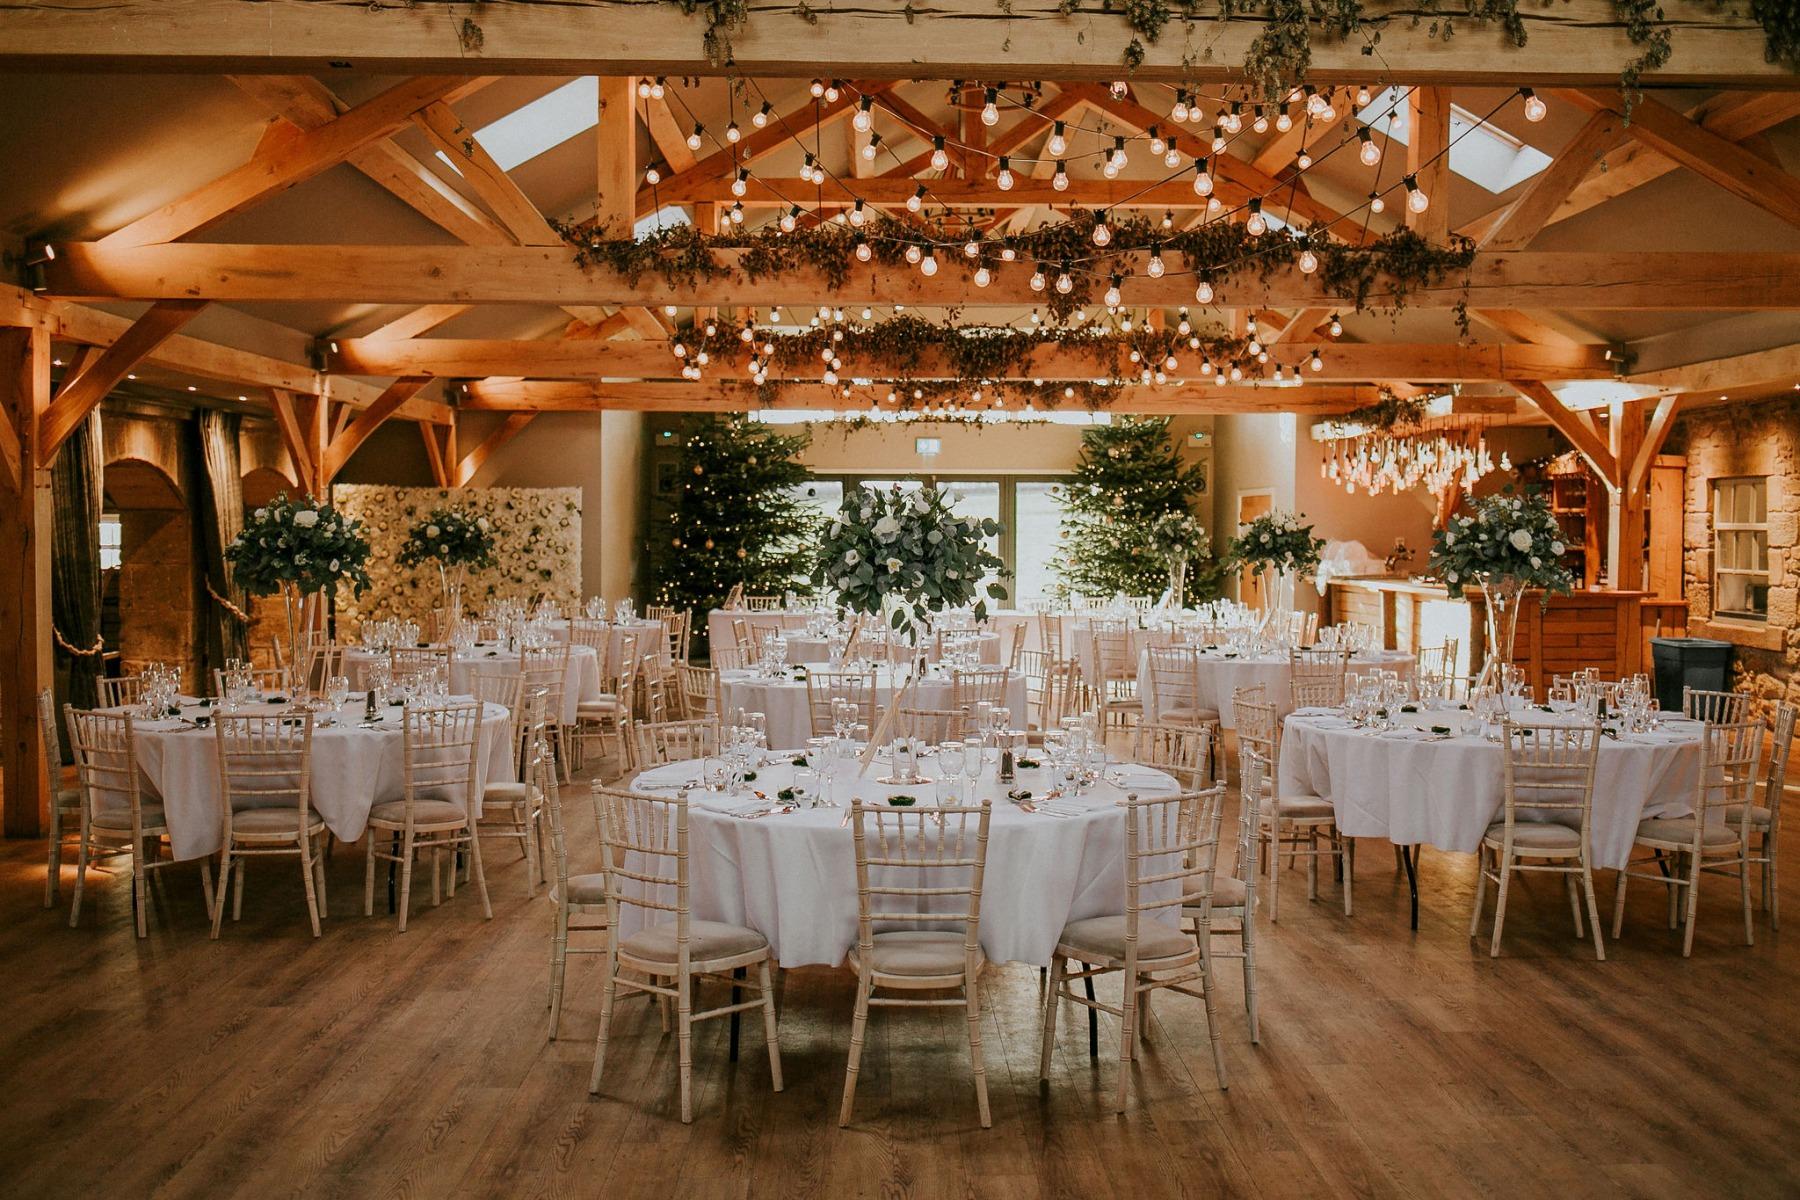 Doxford Barns - Belle Bridal Venue Guest List - Rosie Davison Photography